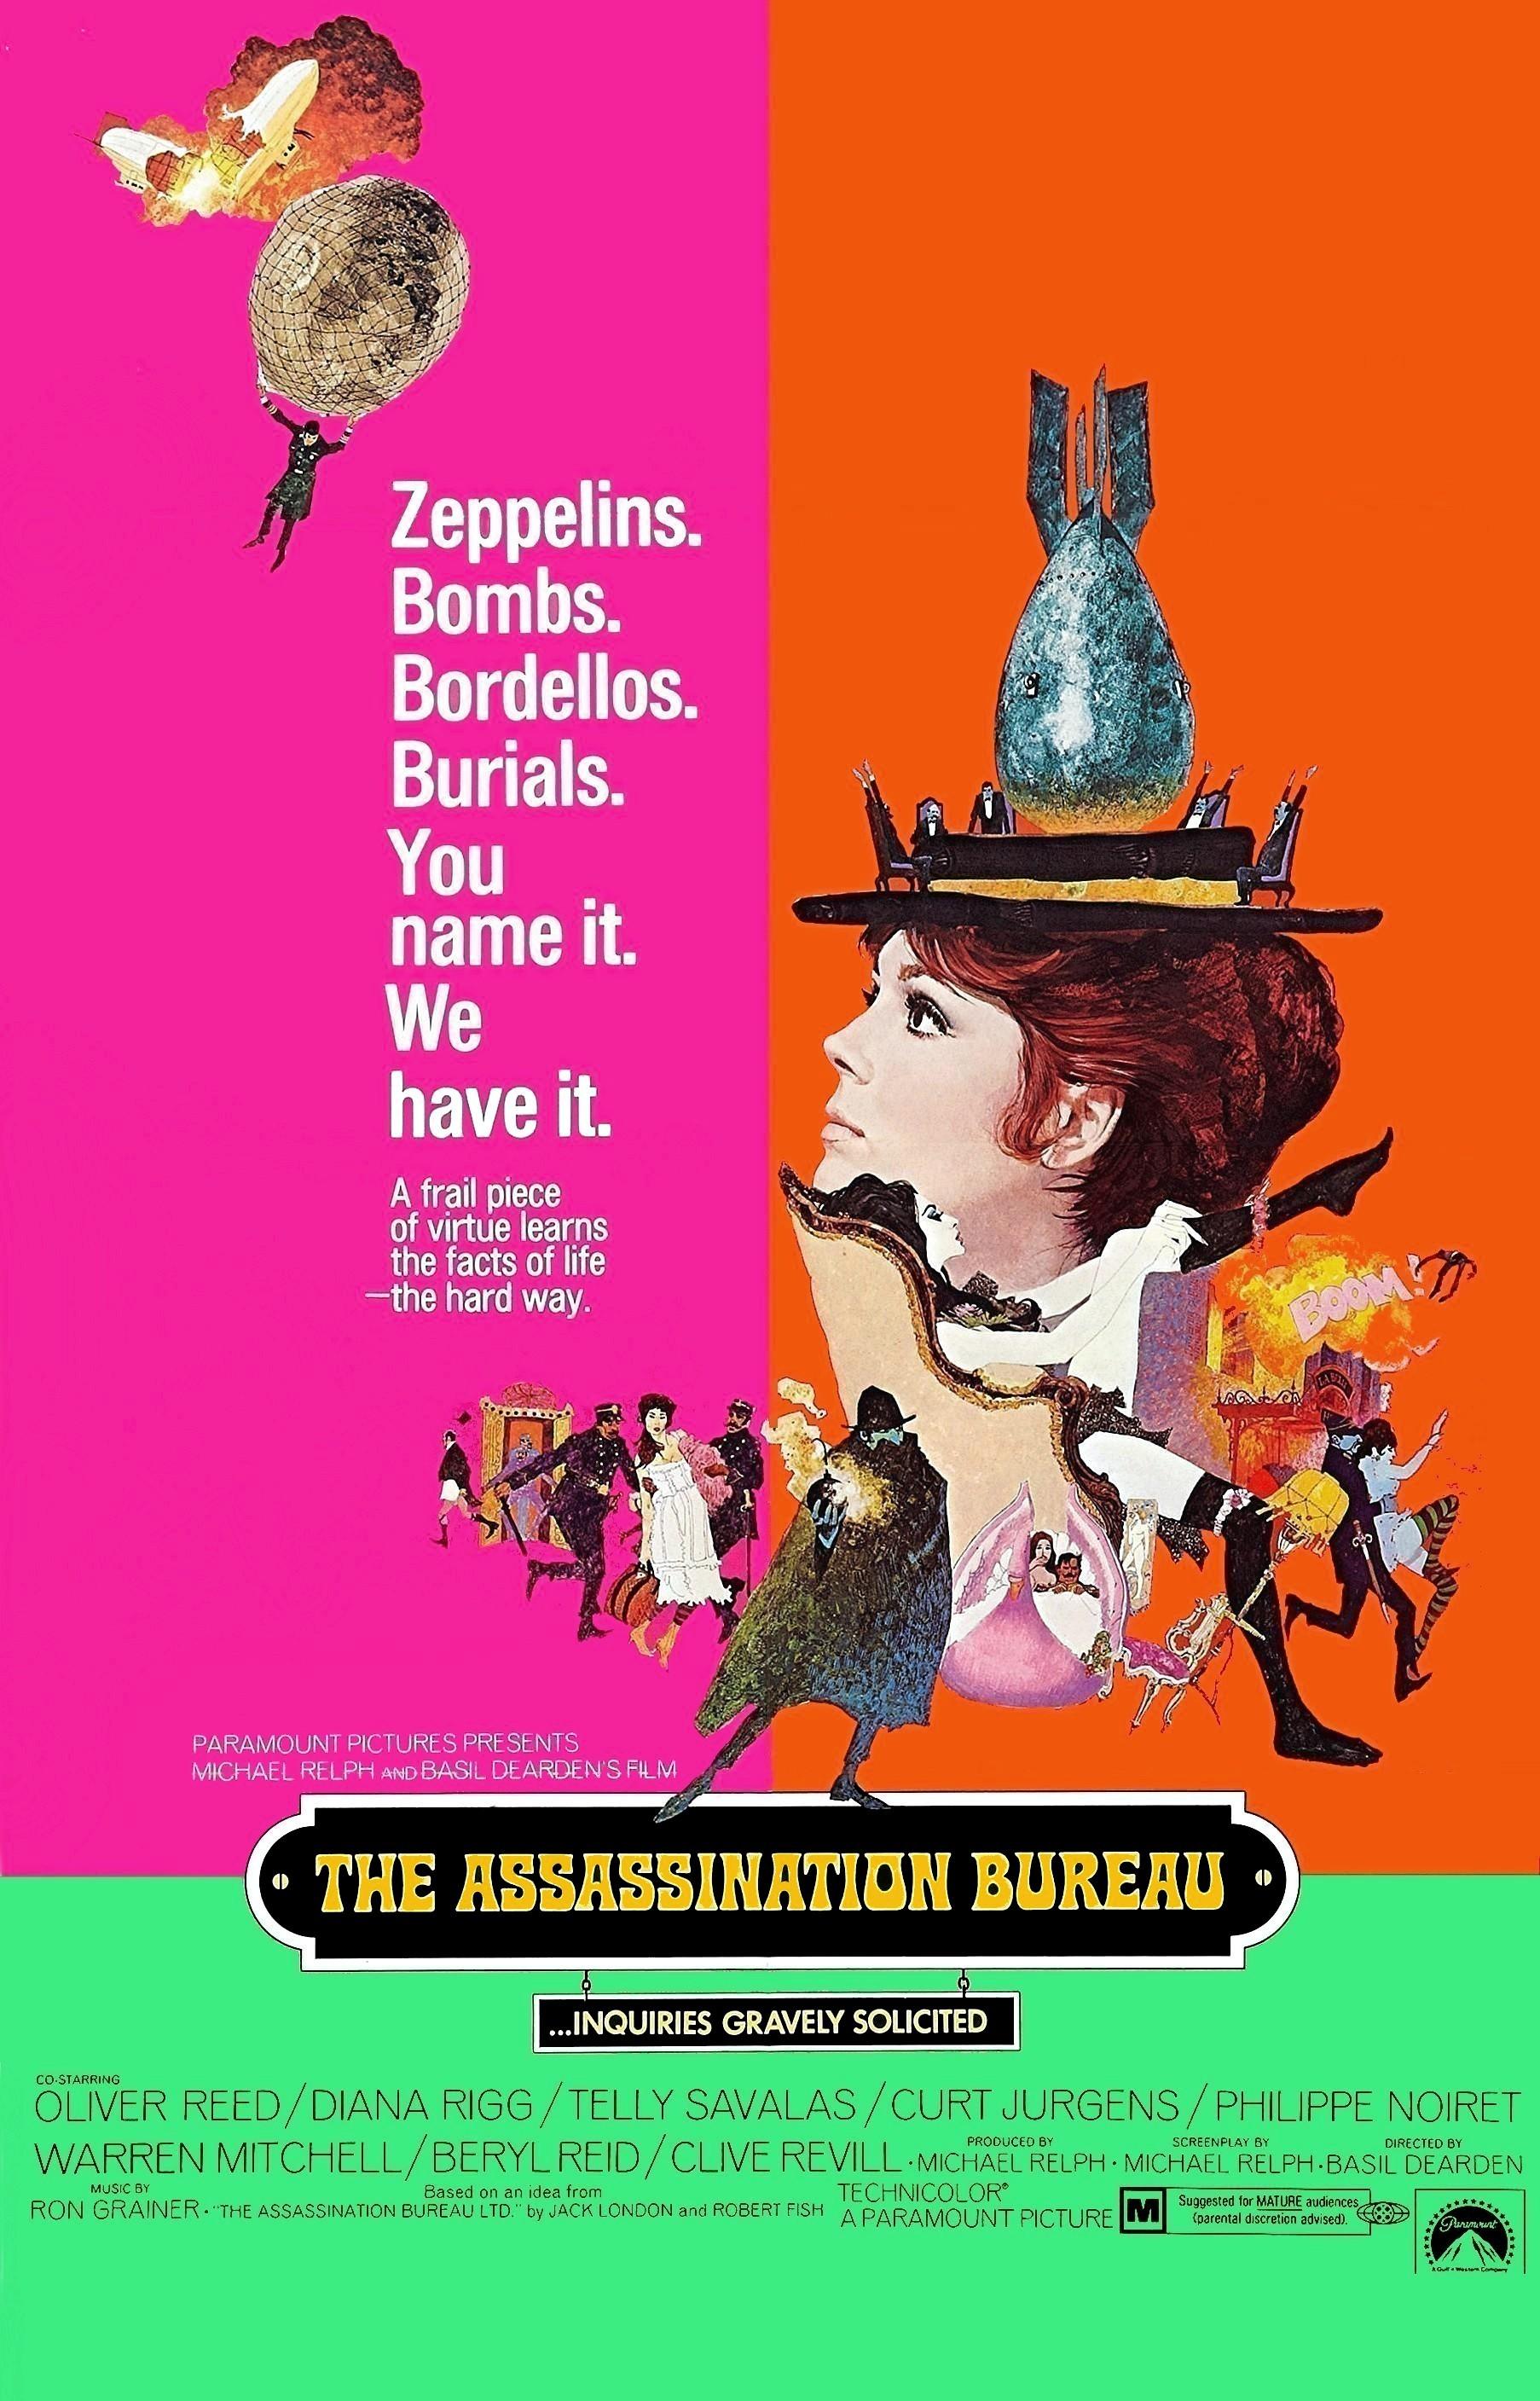 The Assassination Bureau (1969) | Scratchpad | FANDOM